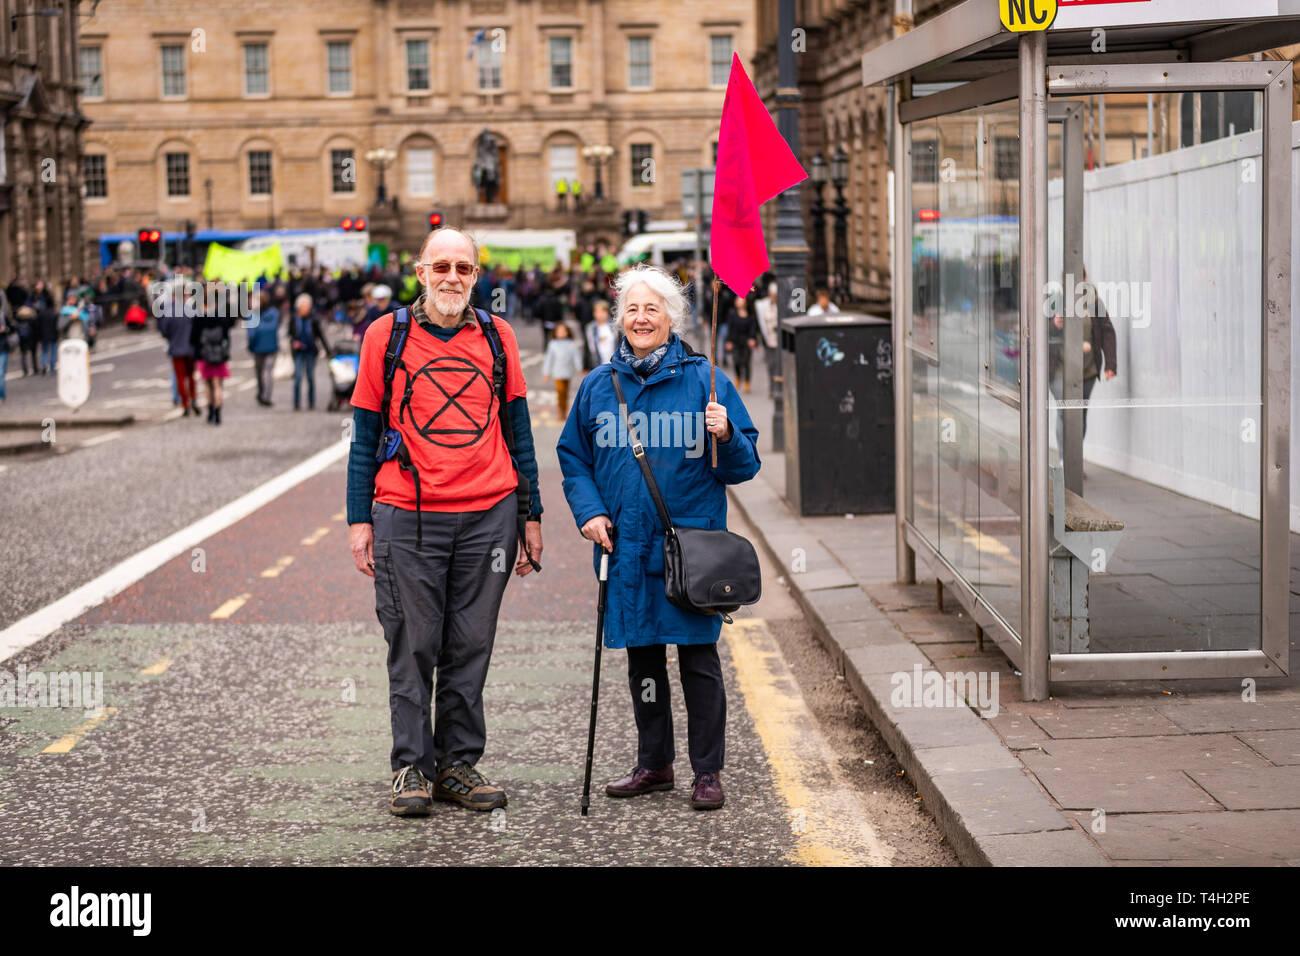 Edinburgh, UK. 16th April 2019. Protesters on North Bridge, Edinburgh, take part in the XR Climate Emergency Roadblock Demonstration. Stock Photo